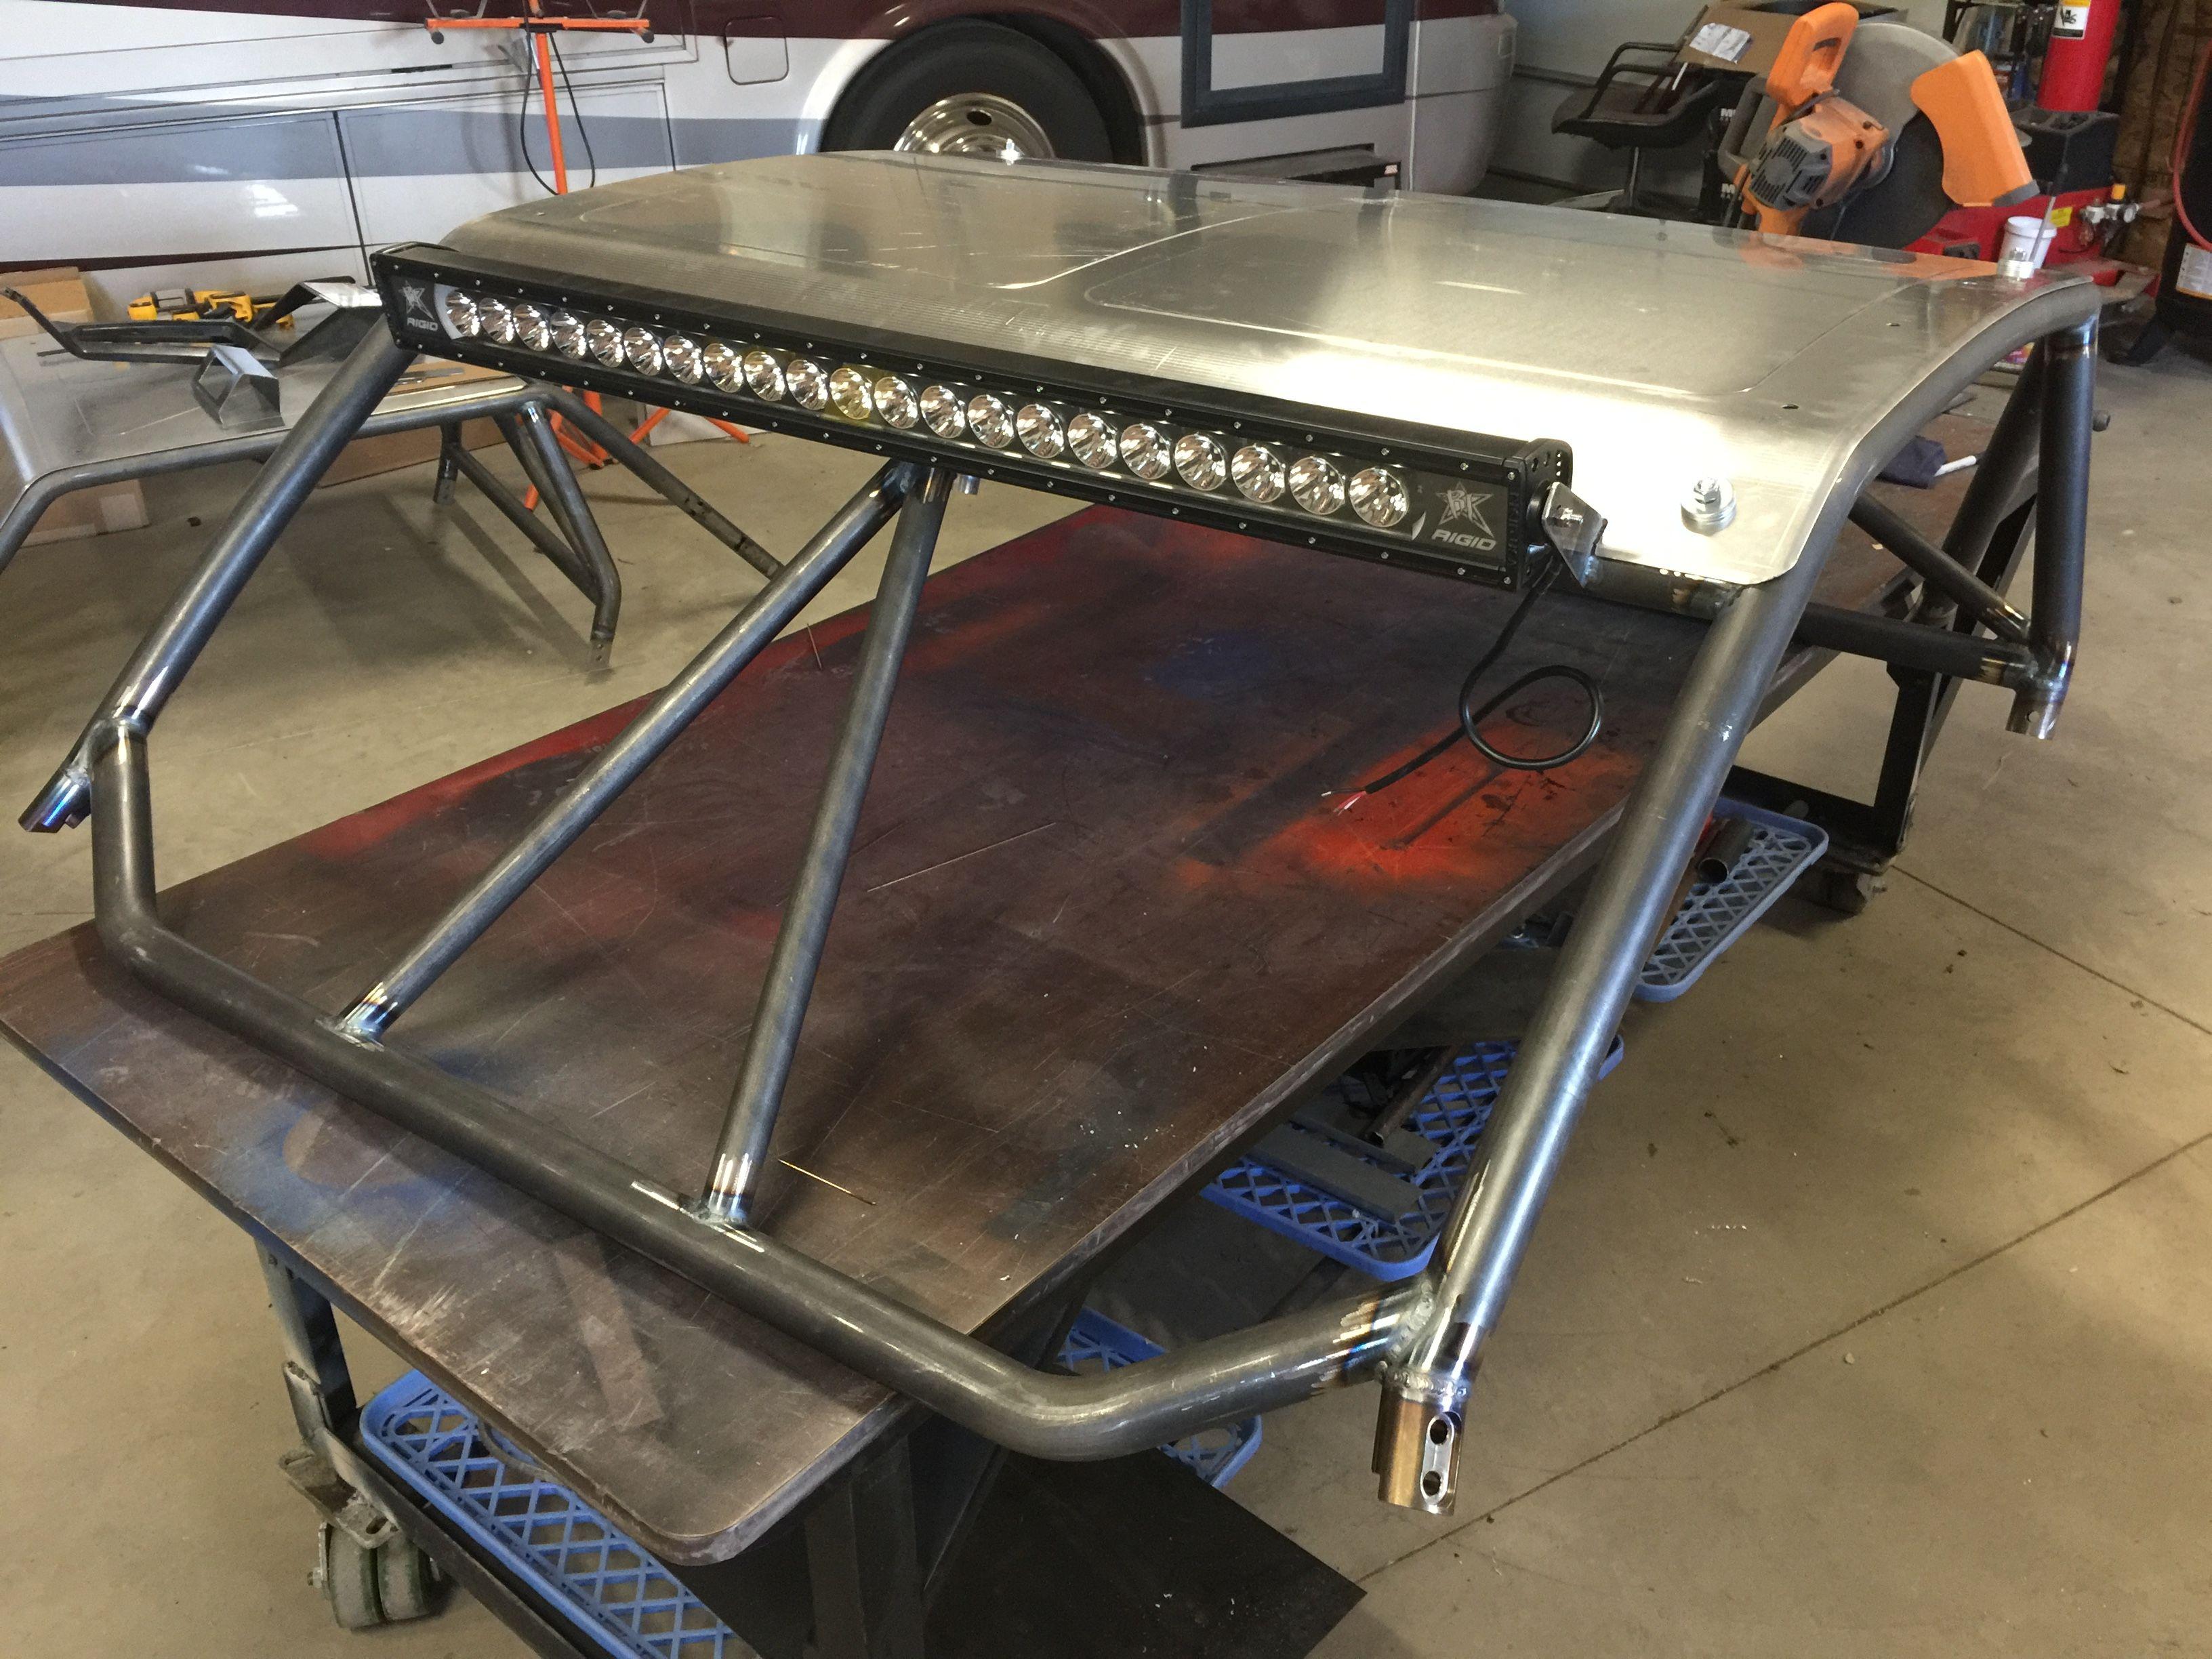 YXZ super shorty #cagewrx cage ready for powdercoat  40